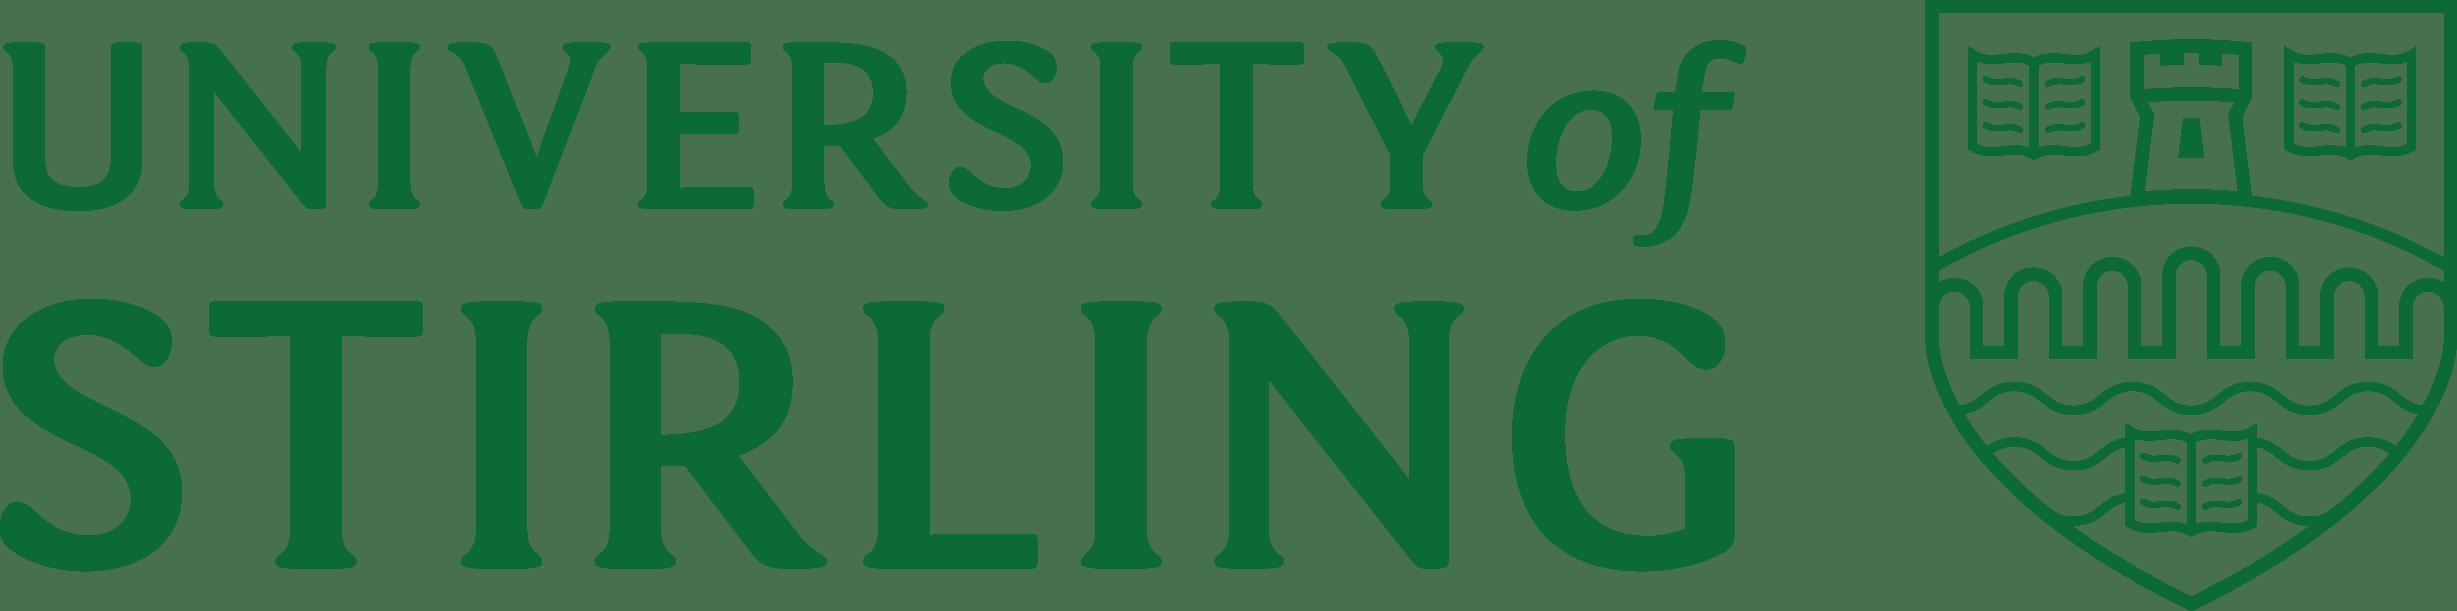 University of Stirling Blogs